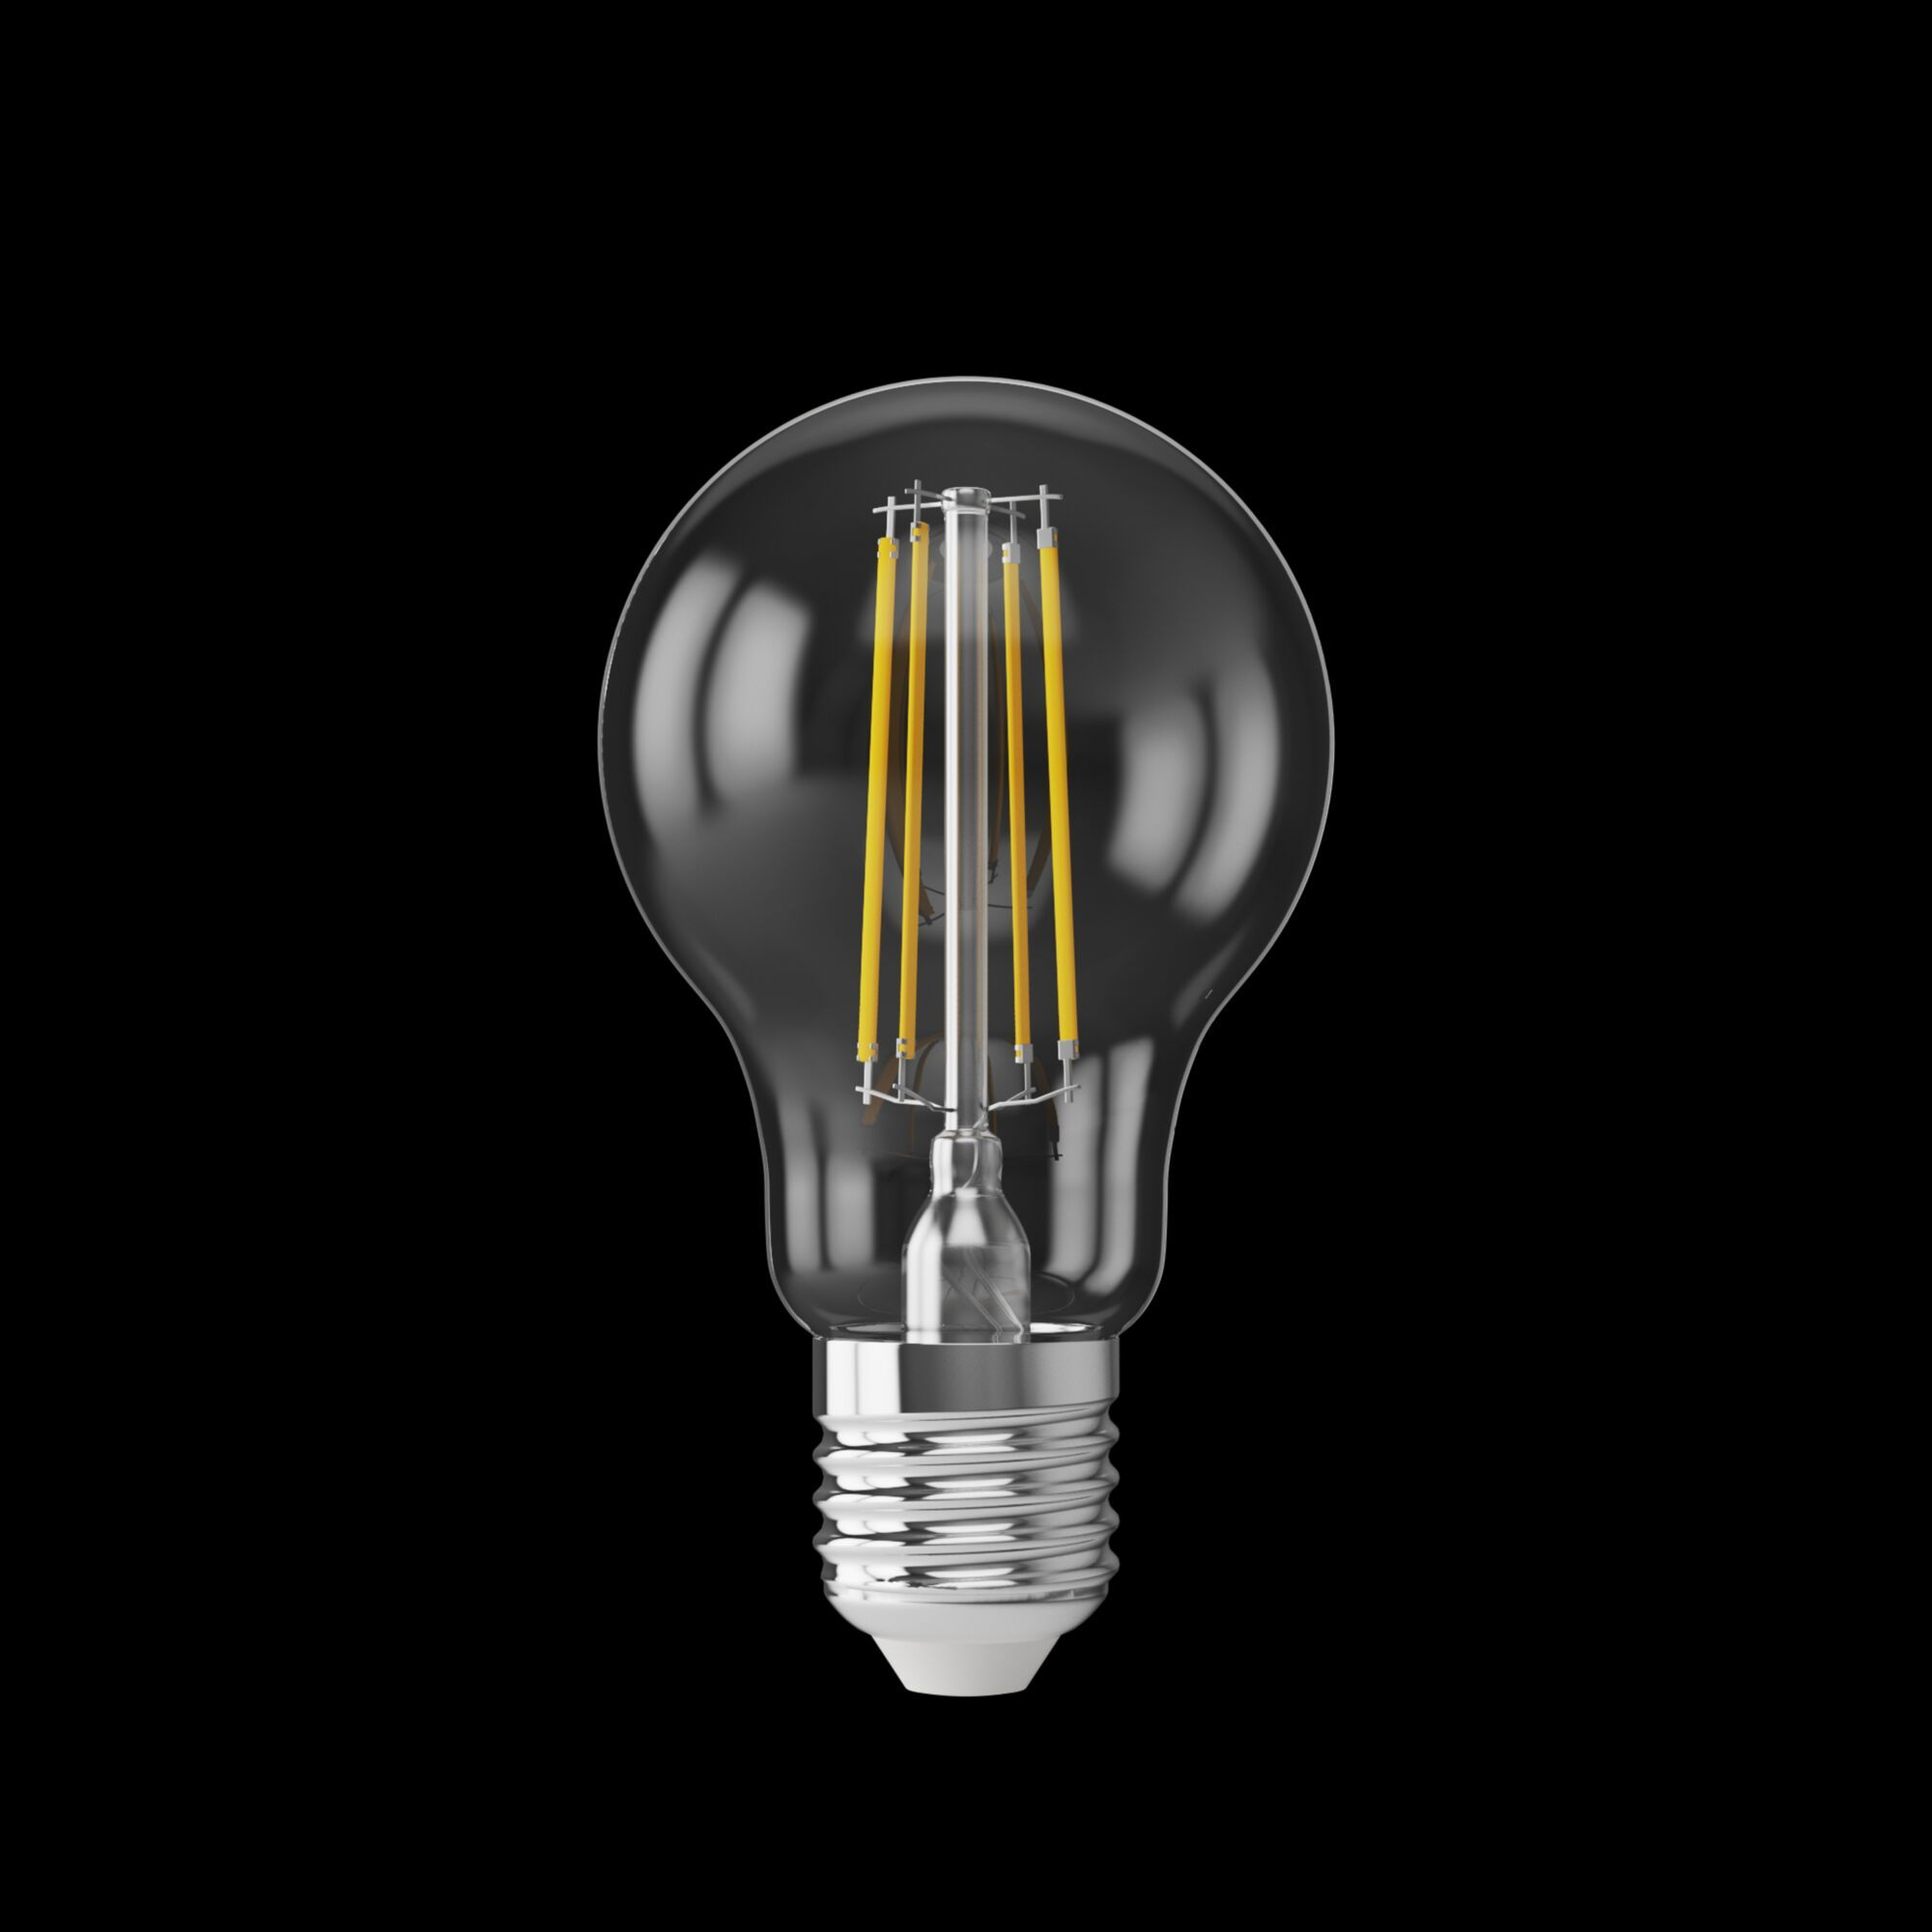 Филаментная светодиодная лампа Voltega Crystal 7141 груша E27 7W, 4000K 220V, гарантия 3 года - фото 2